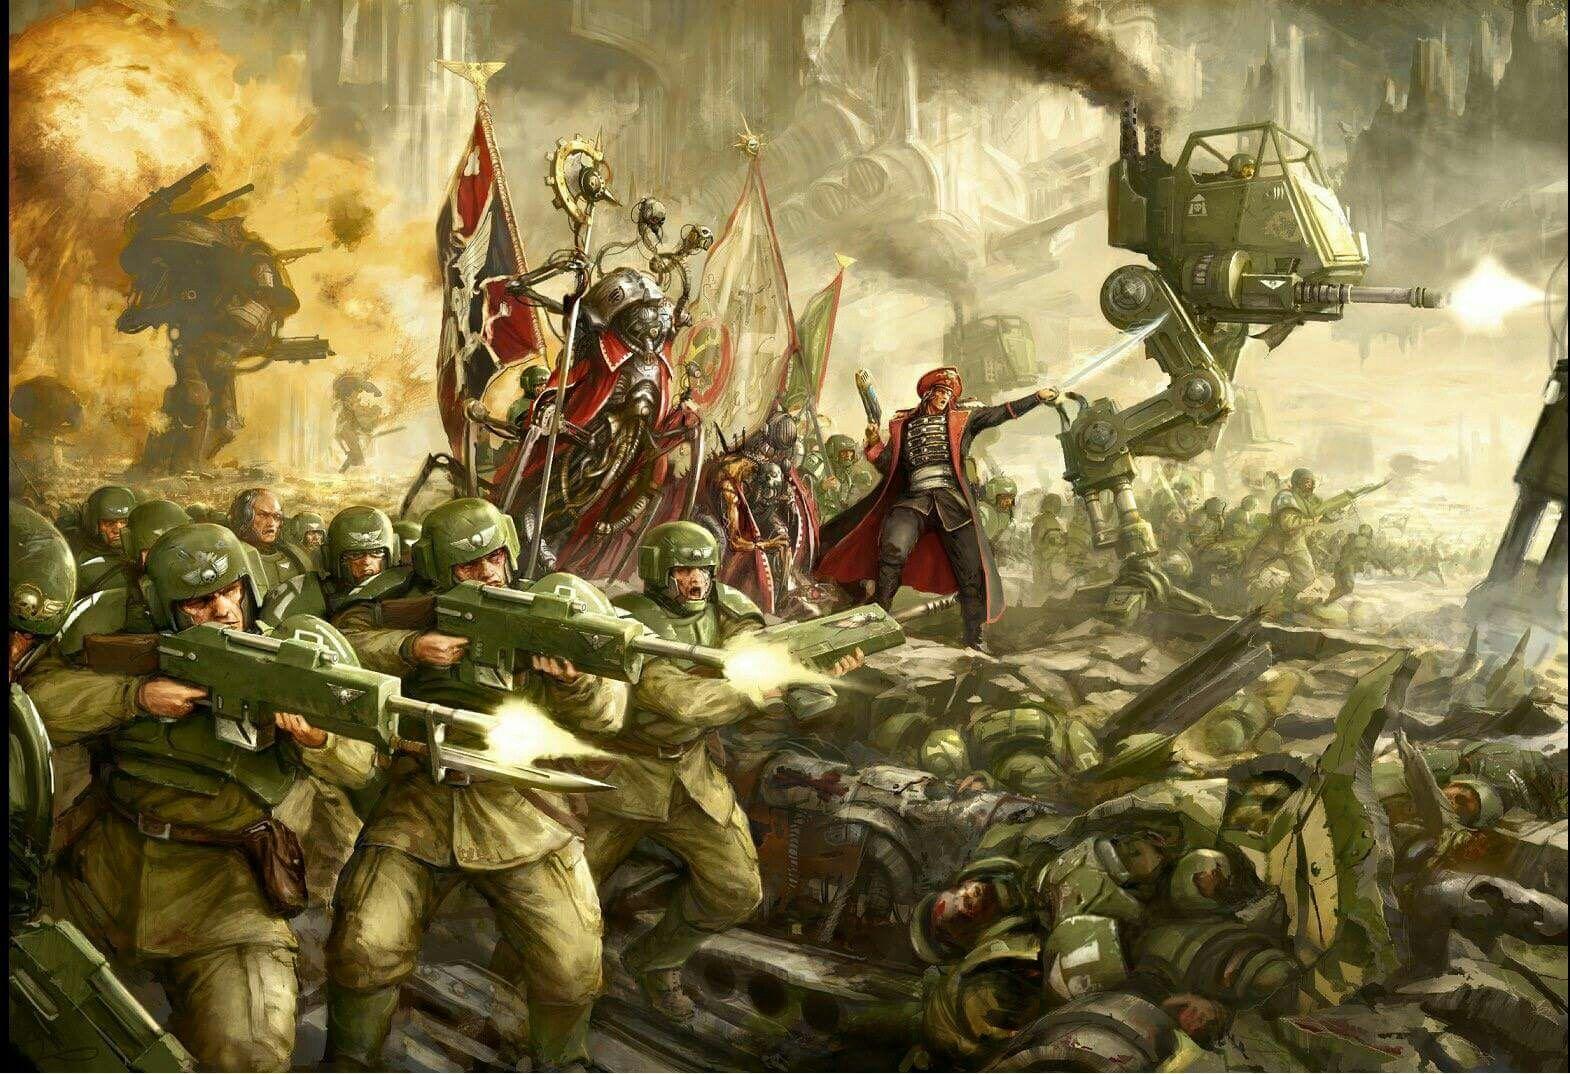 Imperial guard 40K | Warhammer art, Warhammer 40k ...